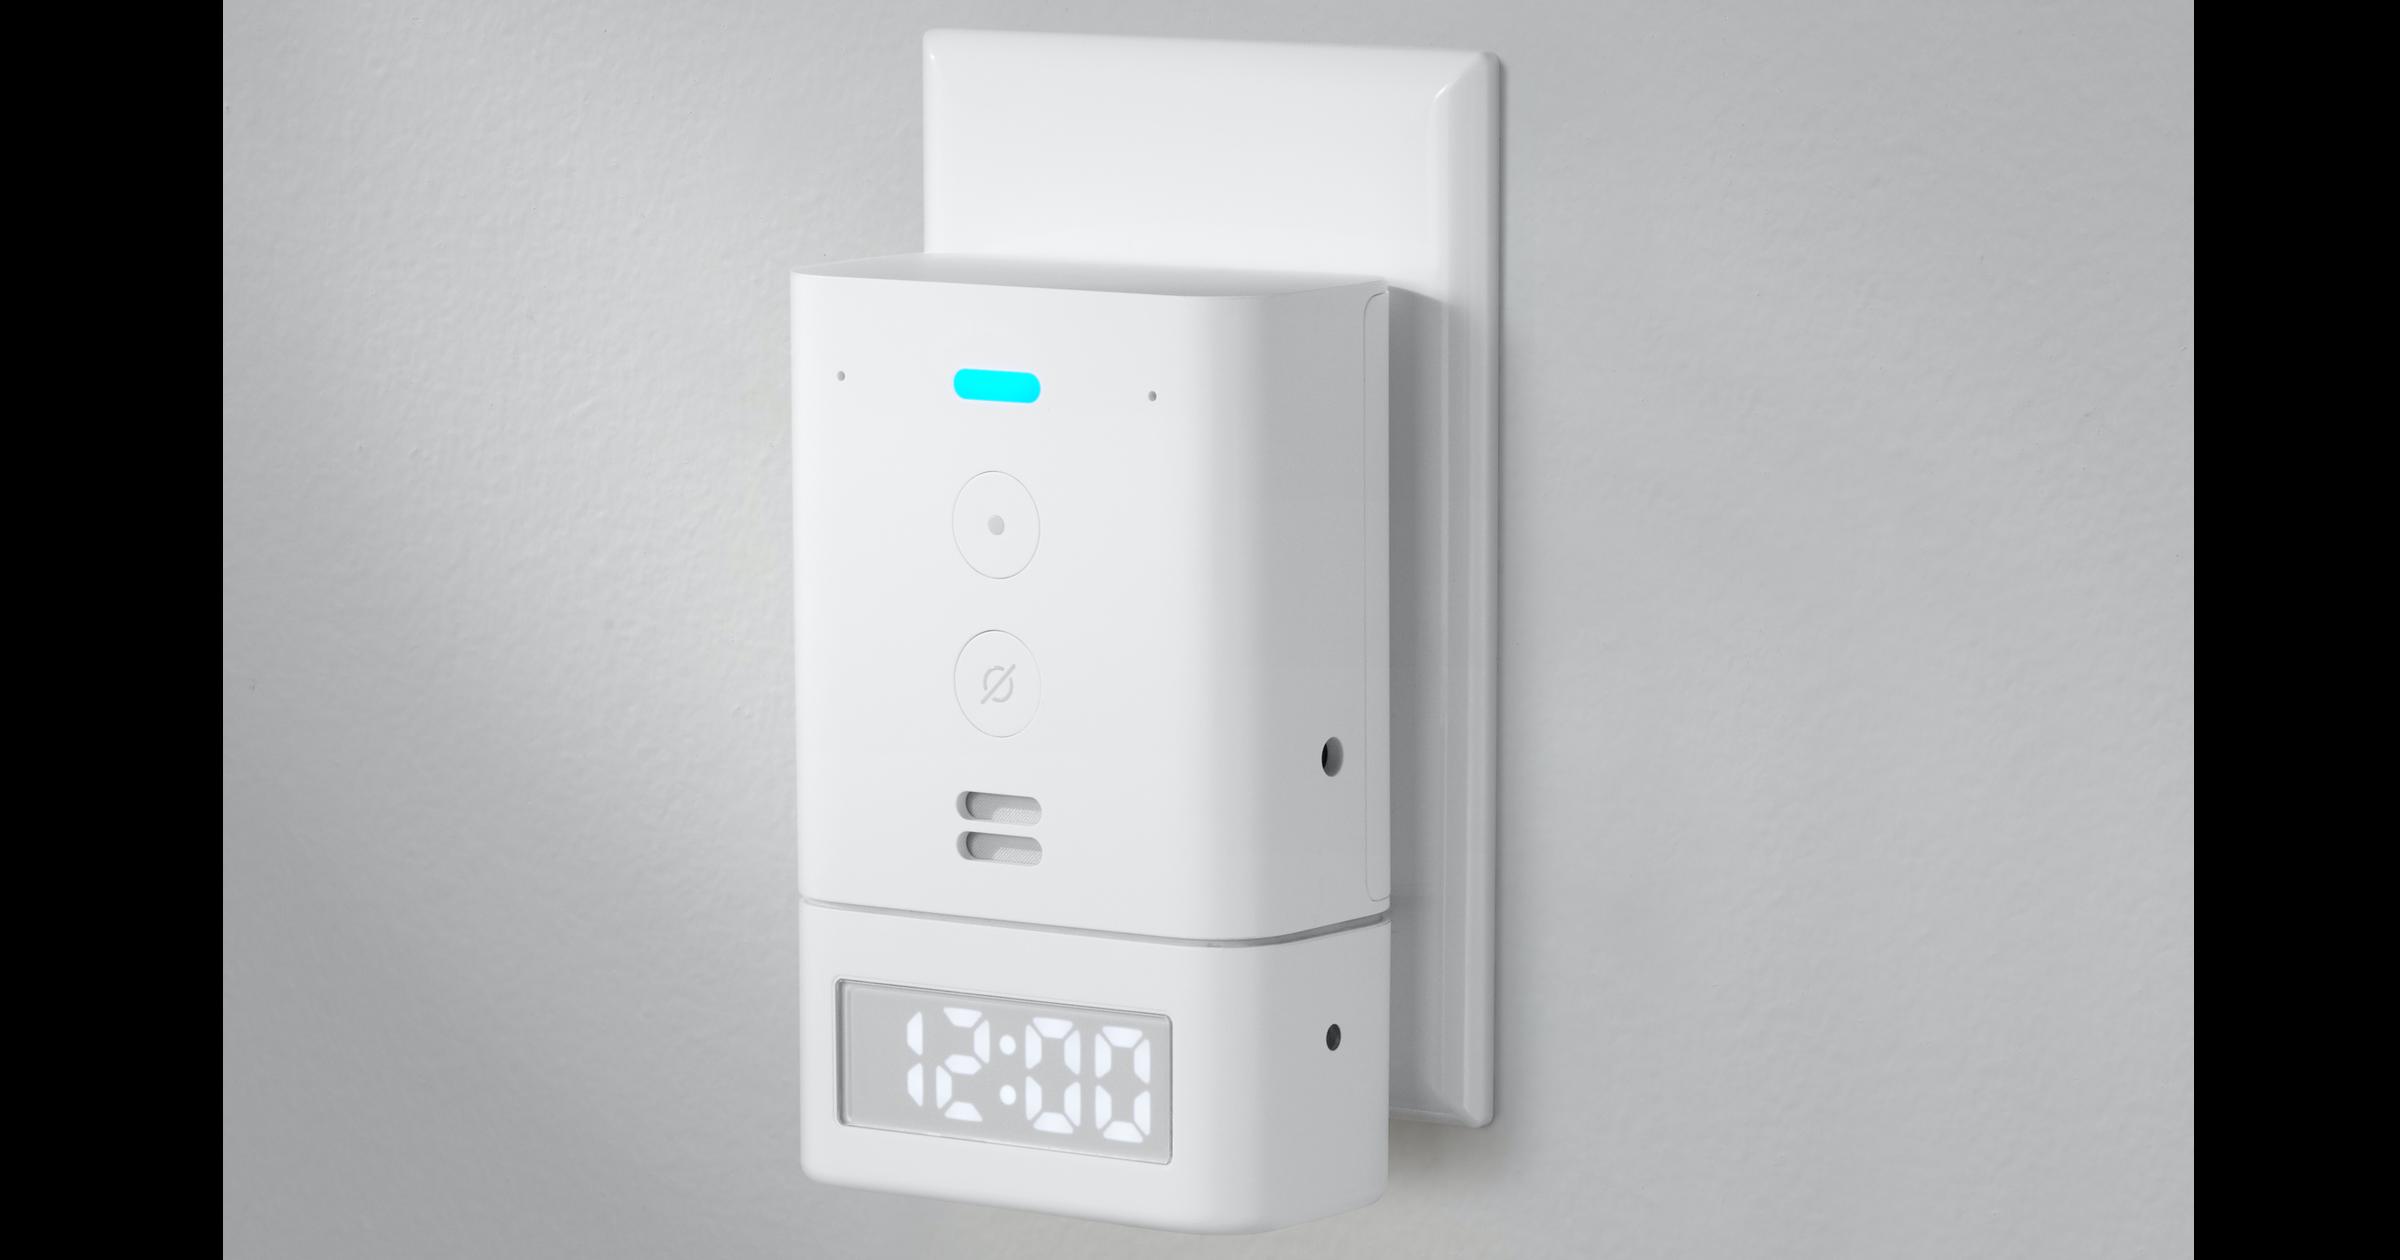 FitBit Flex Smart Clock